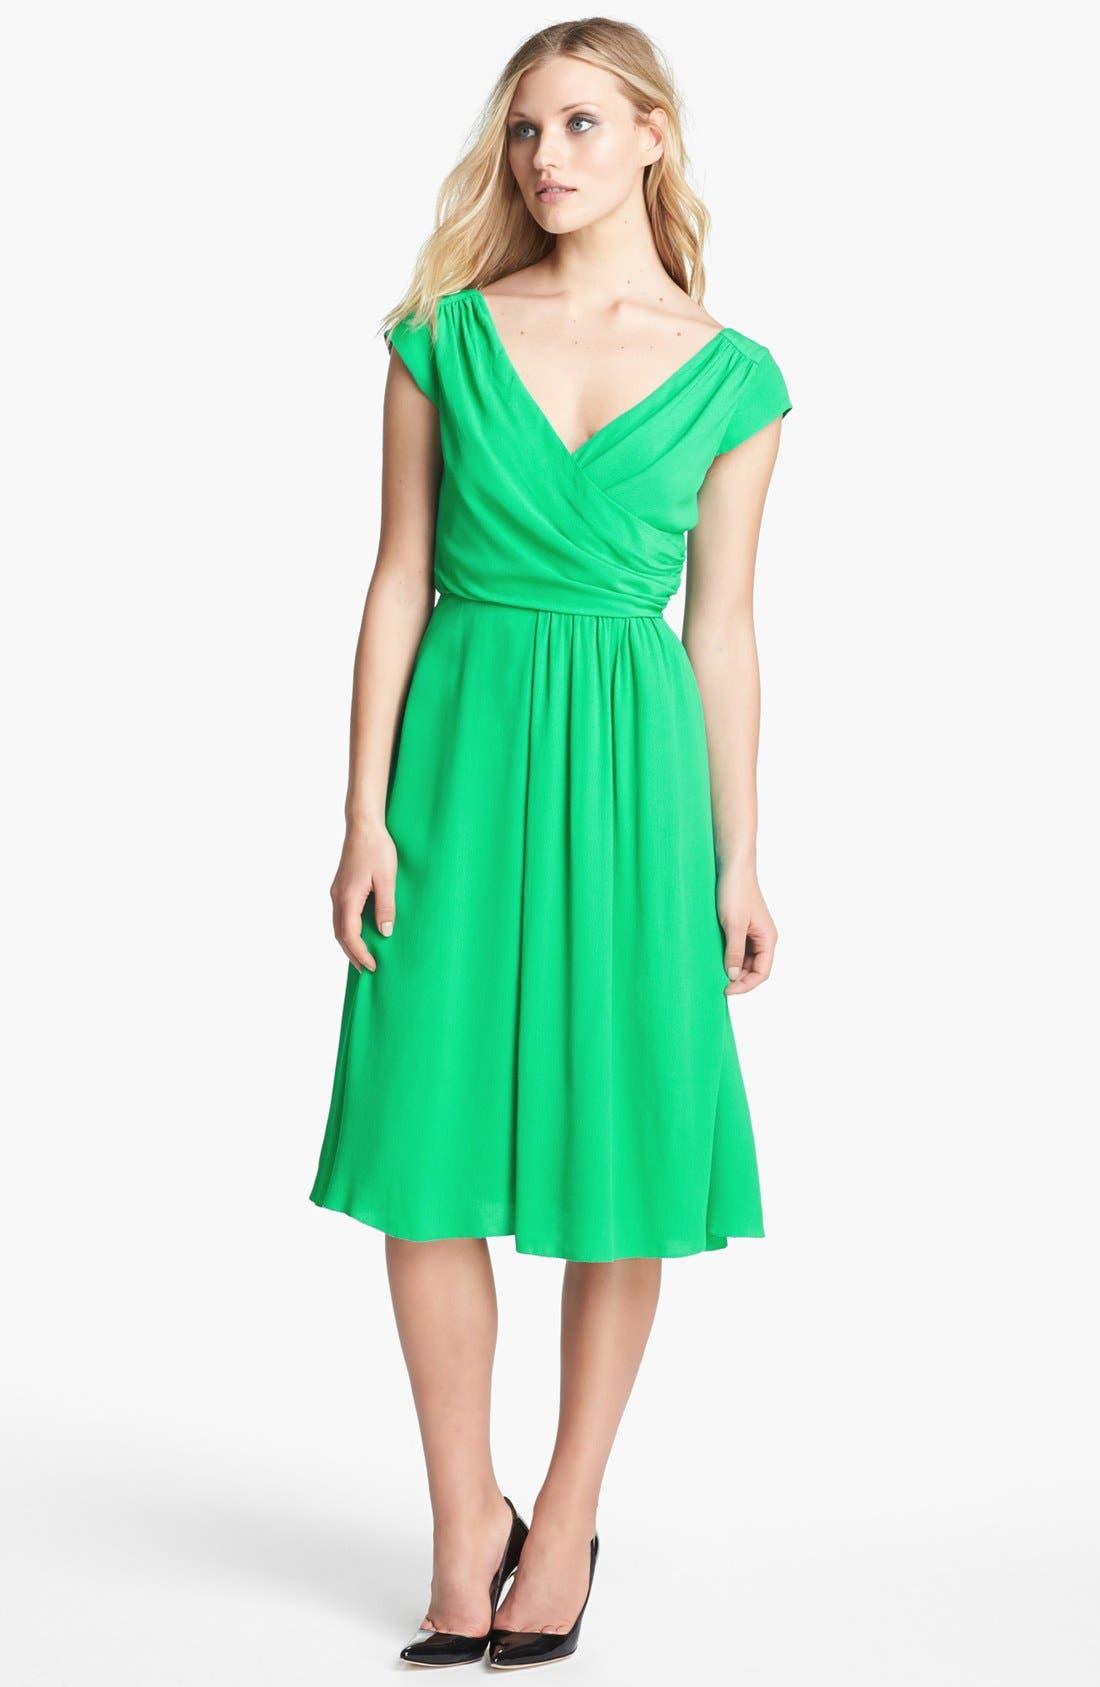 Main Image - kate spade new york 'lucia' dress